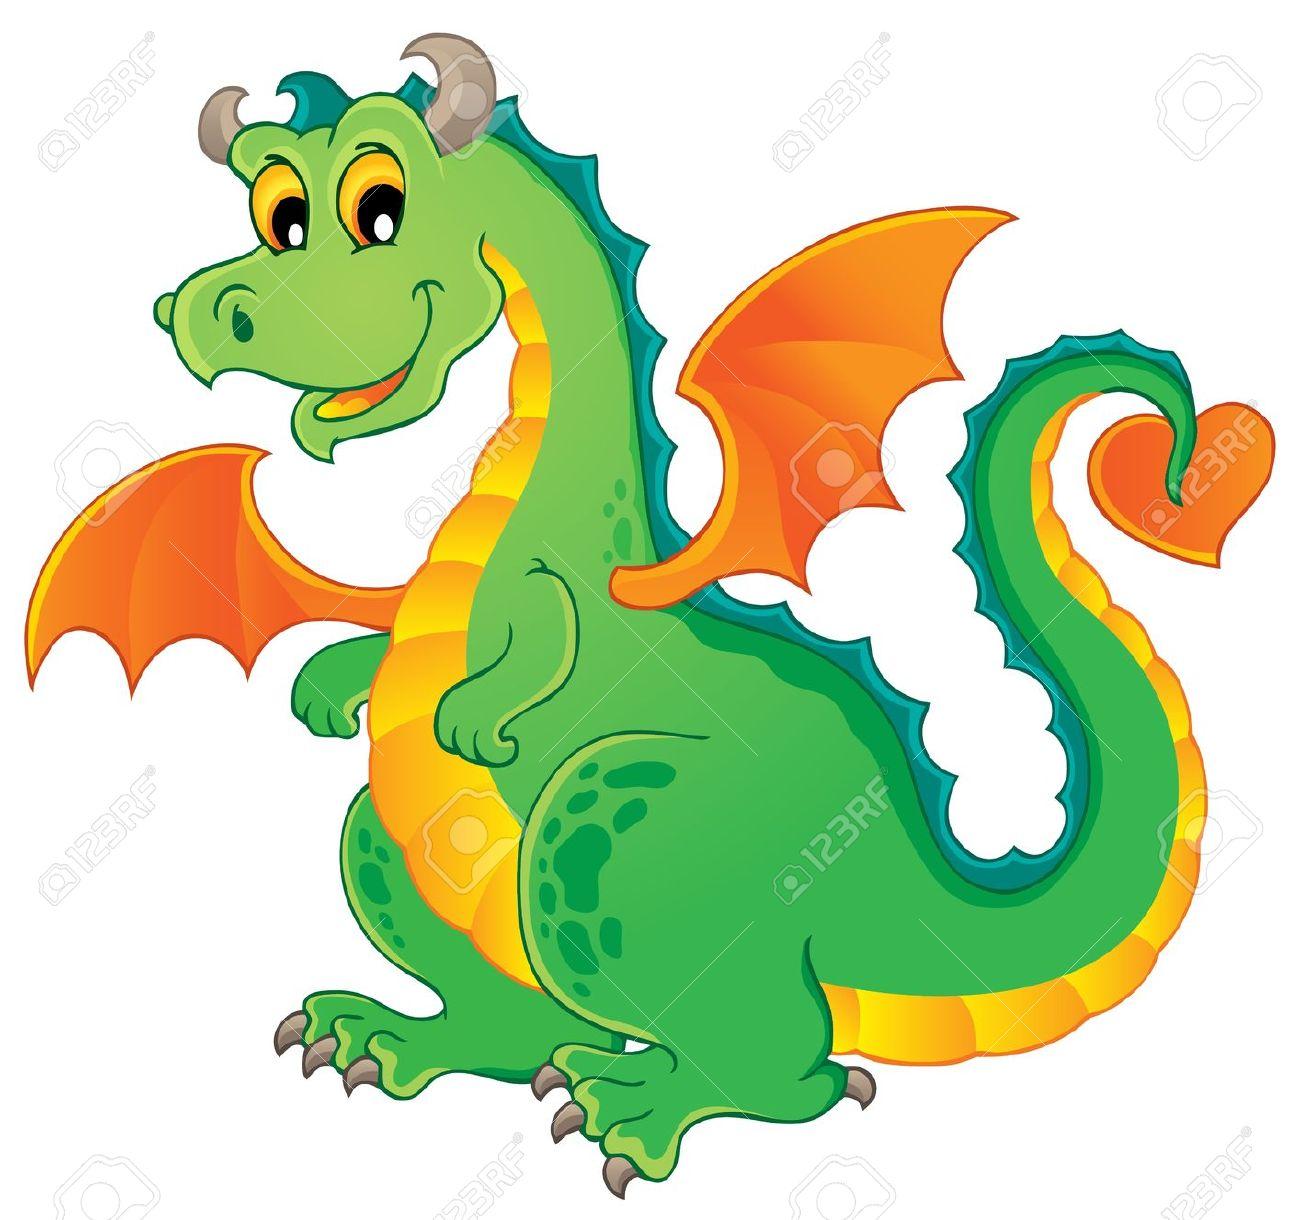 Dragon clipart Clip 92 Dragon Clipart Top